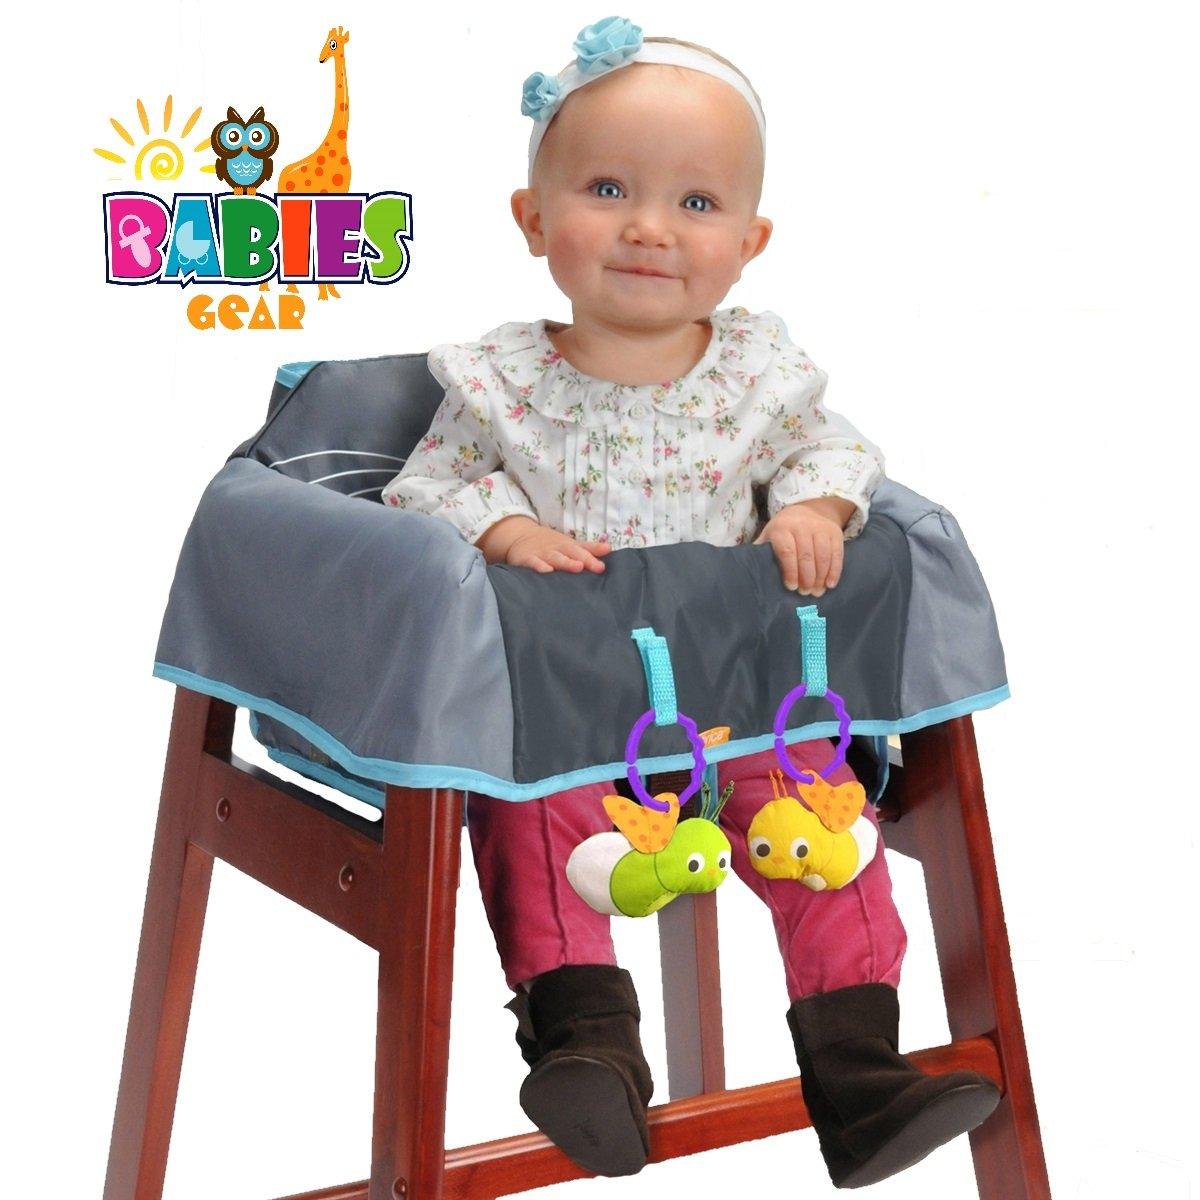 Miraculous Amazon Com Protective Highchair Cover For Babies Spiritservingveterans Wood Chair Design Ideas Spiritservingveteransorg